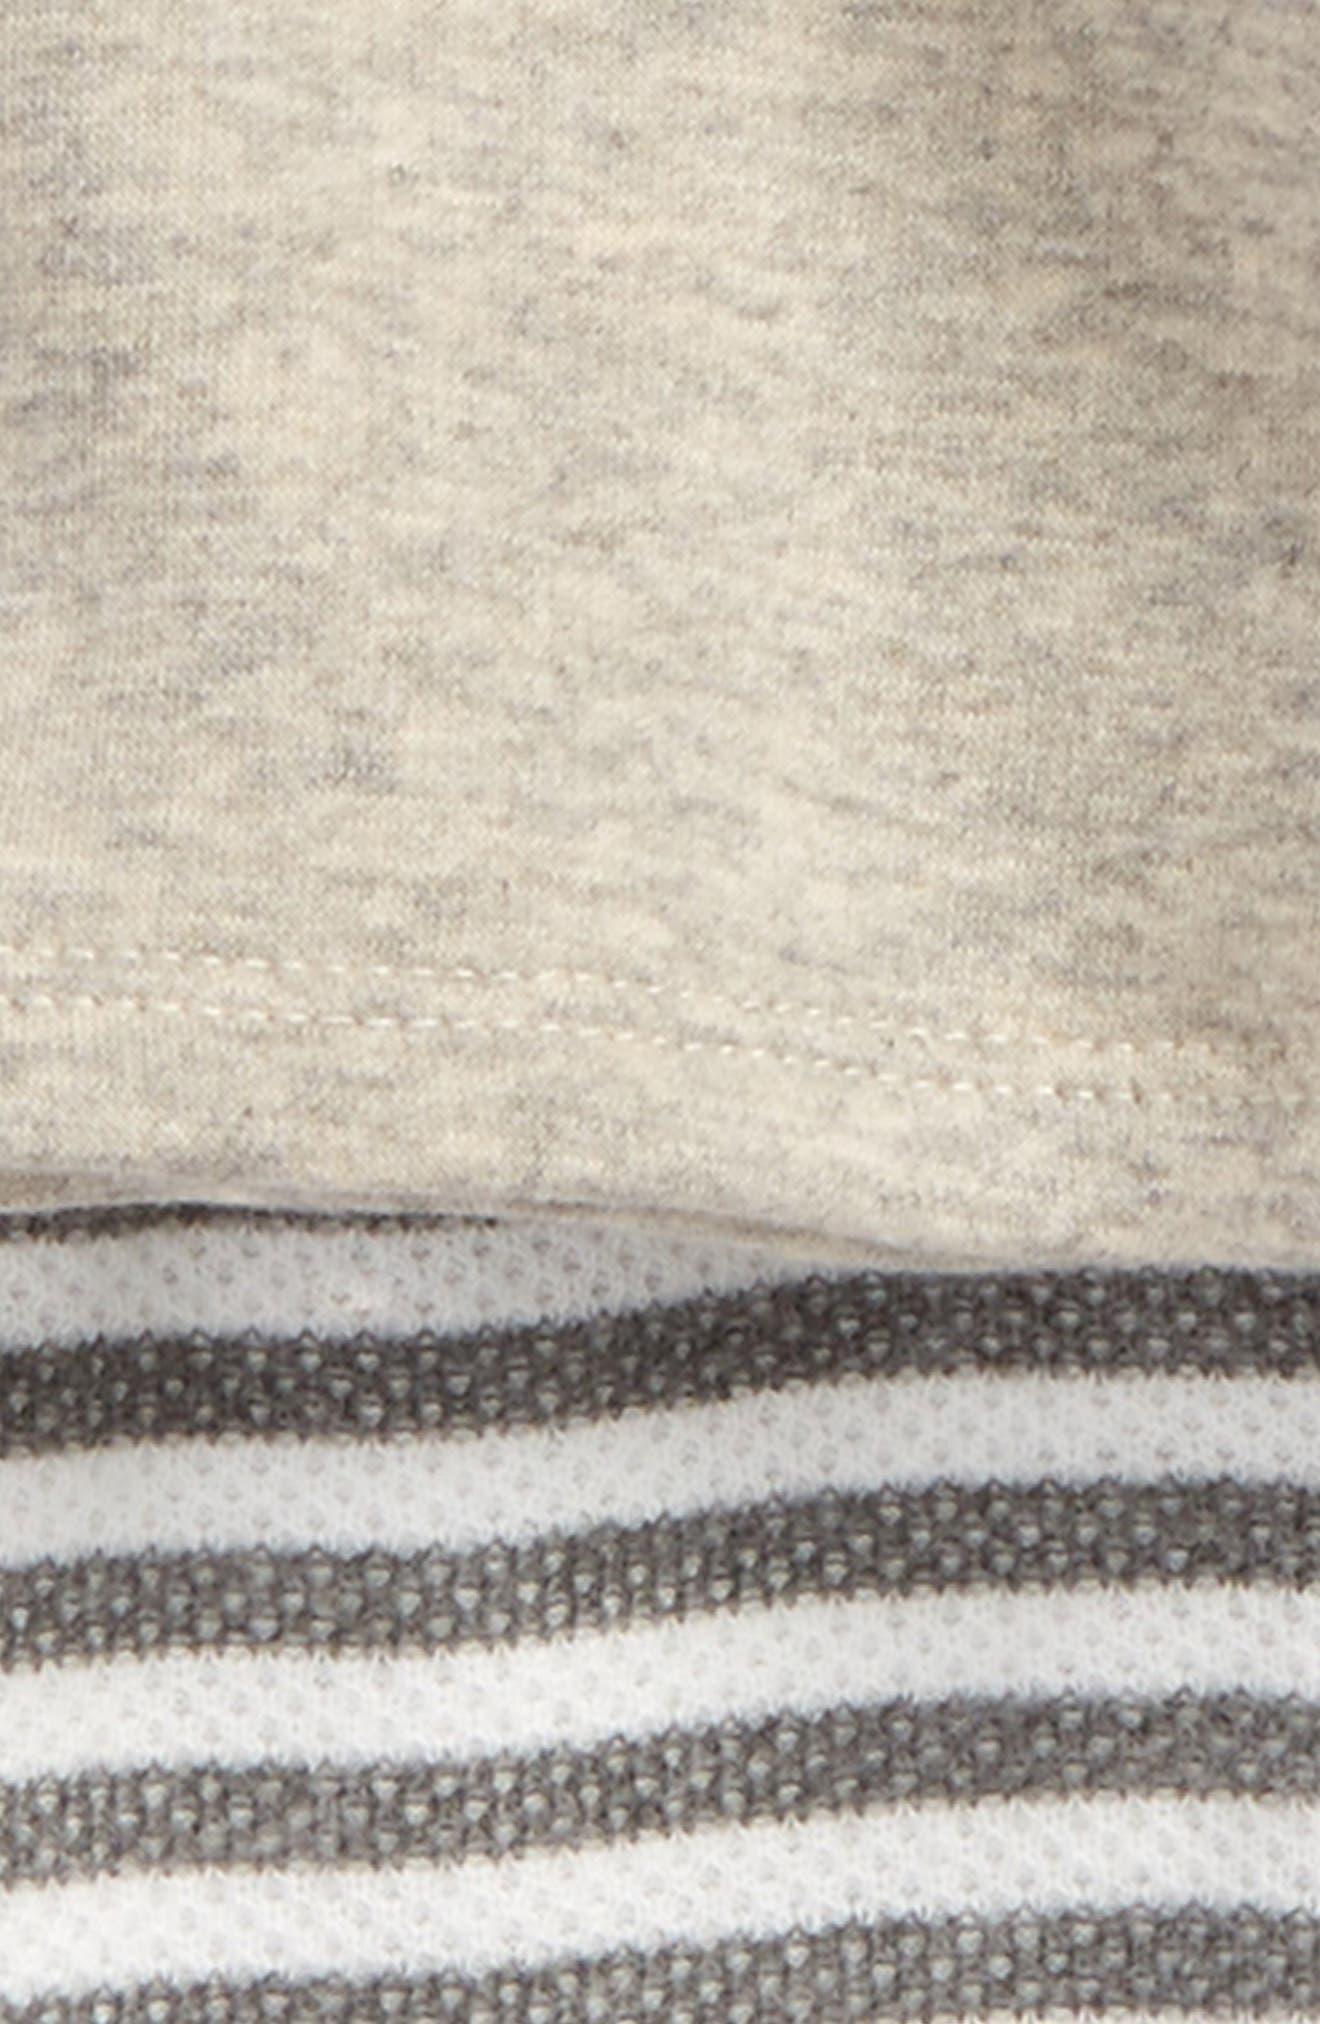 Cozy Bunny Sweatshirt & Leggings Set,                             Alternate thumbnail 2, color,                             Grey Mist Heather Rabbit